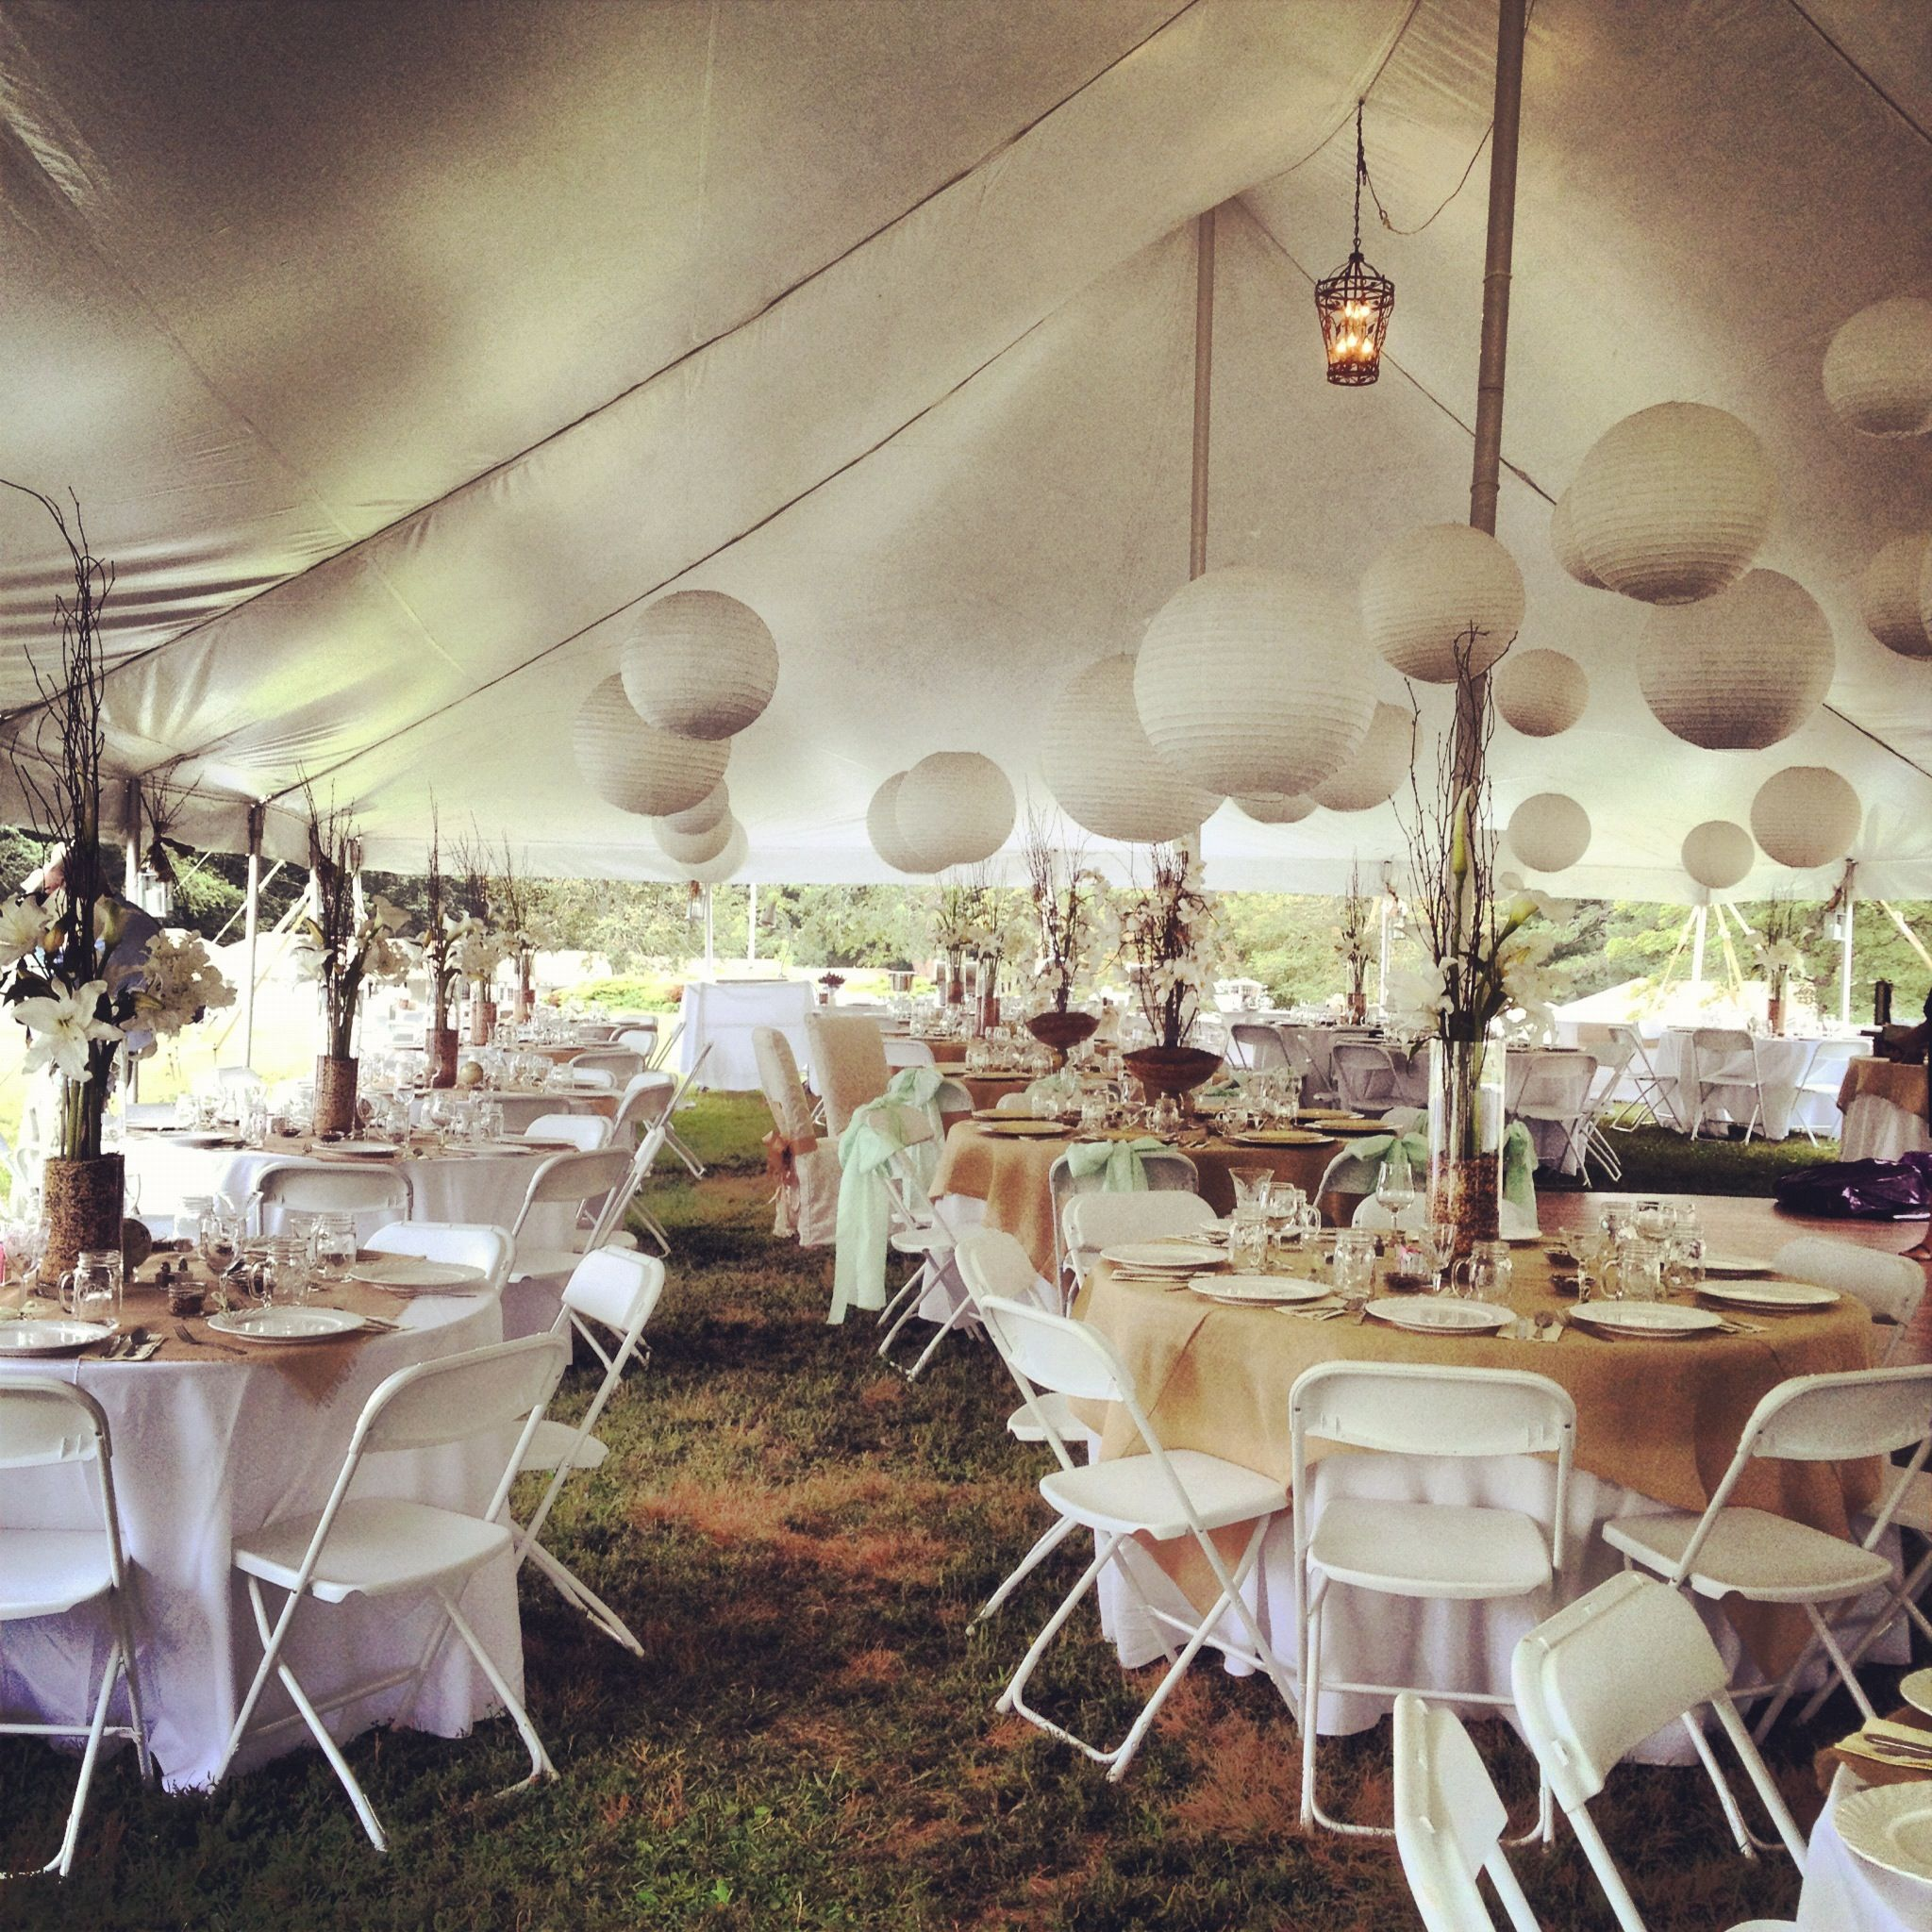 Tent reception Tent reception, Tent wedding, Outdoor